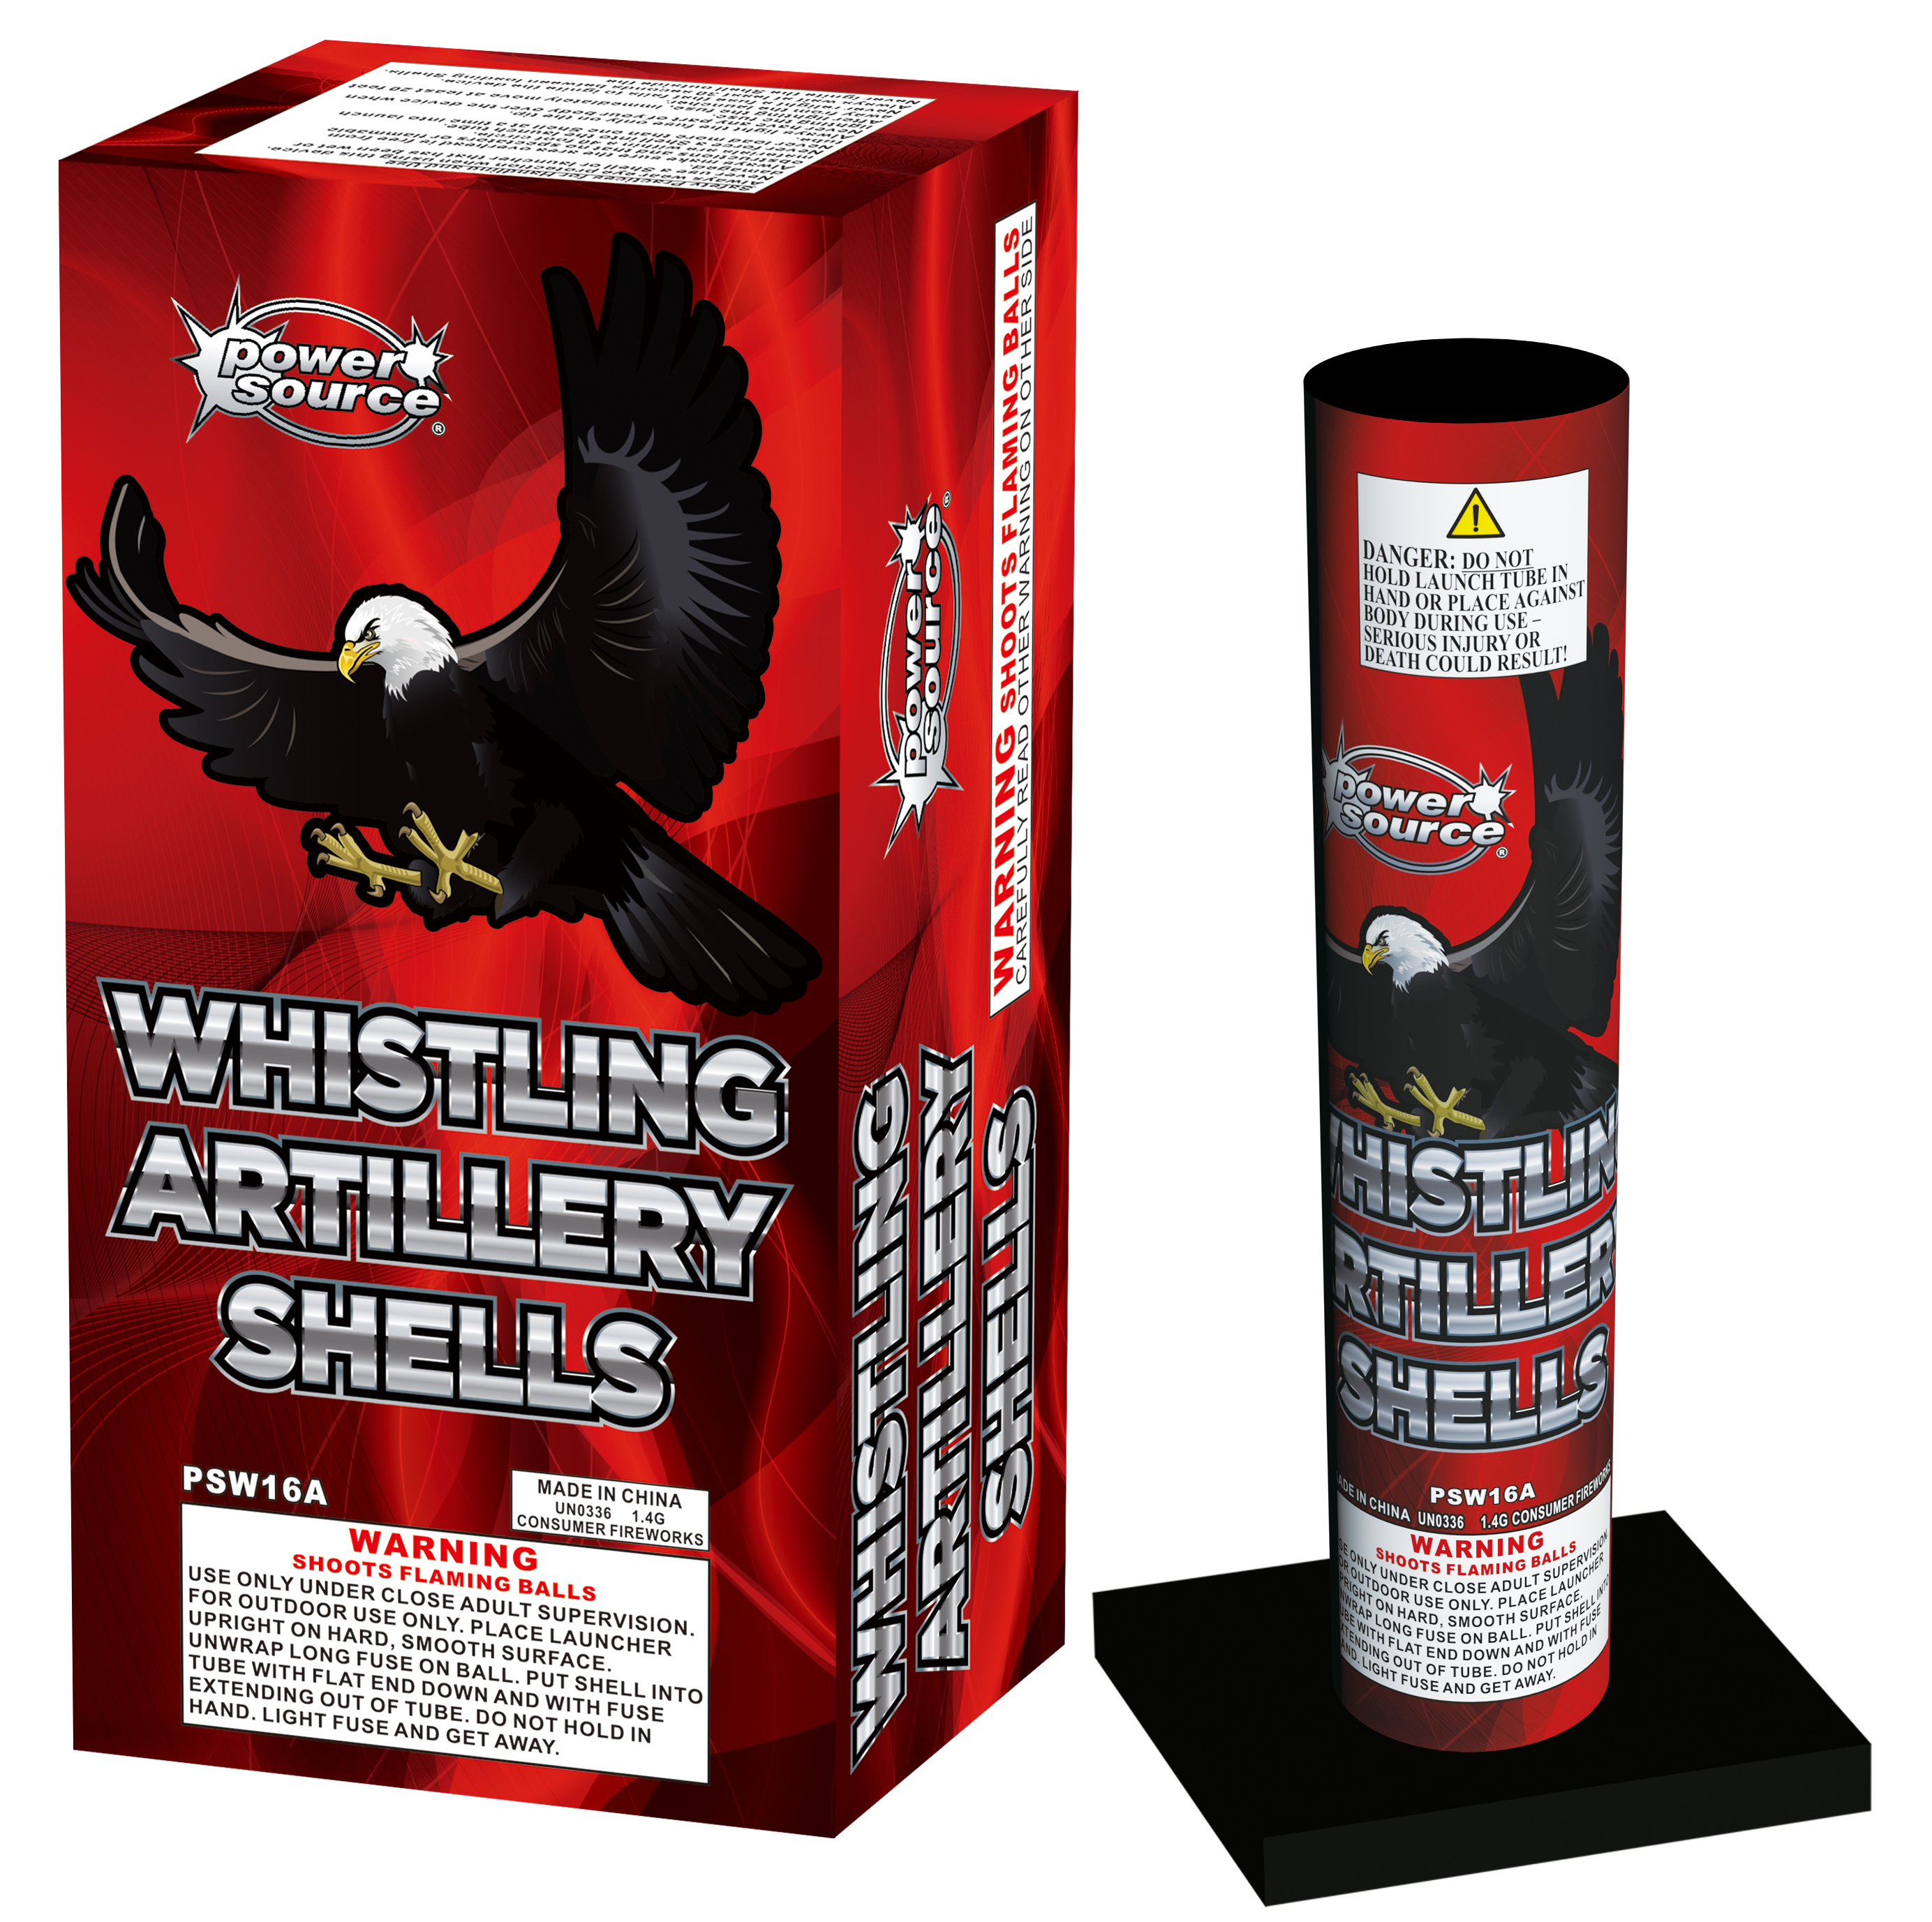 Whistling Artillery Shells - Zort's Fireworks